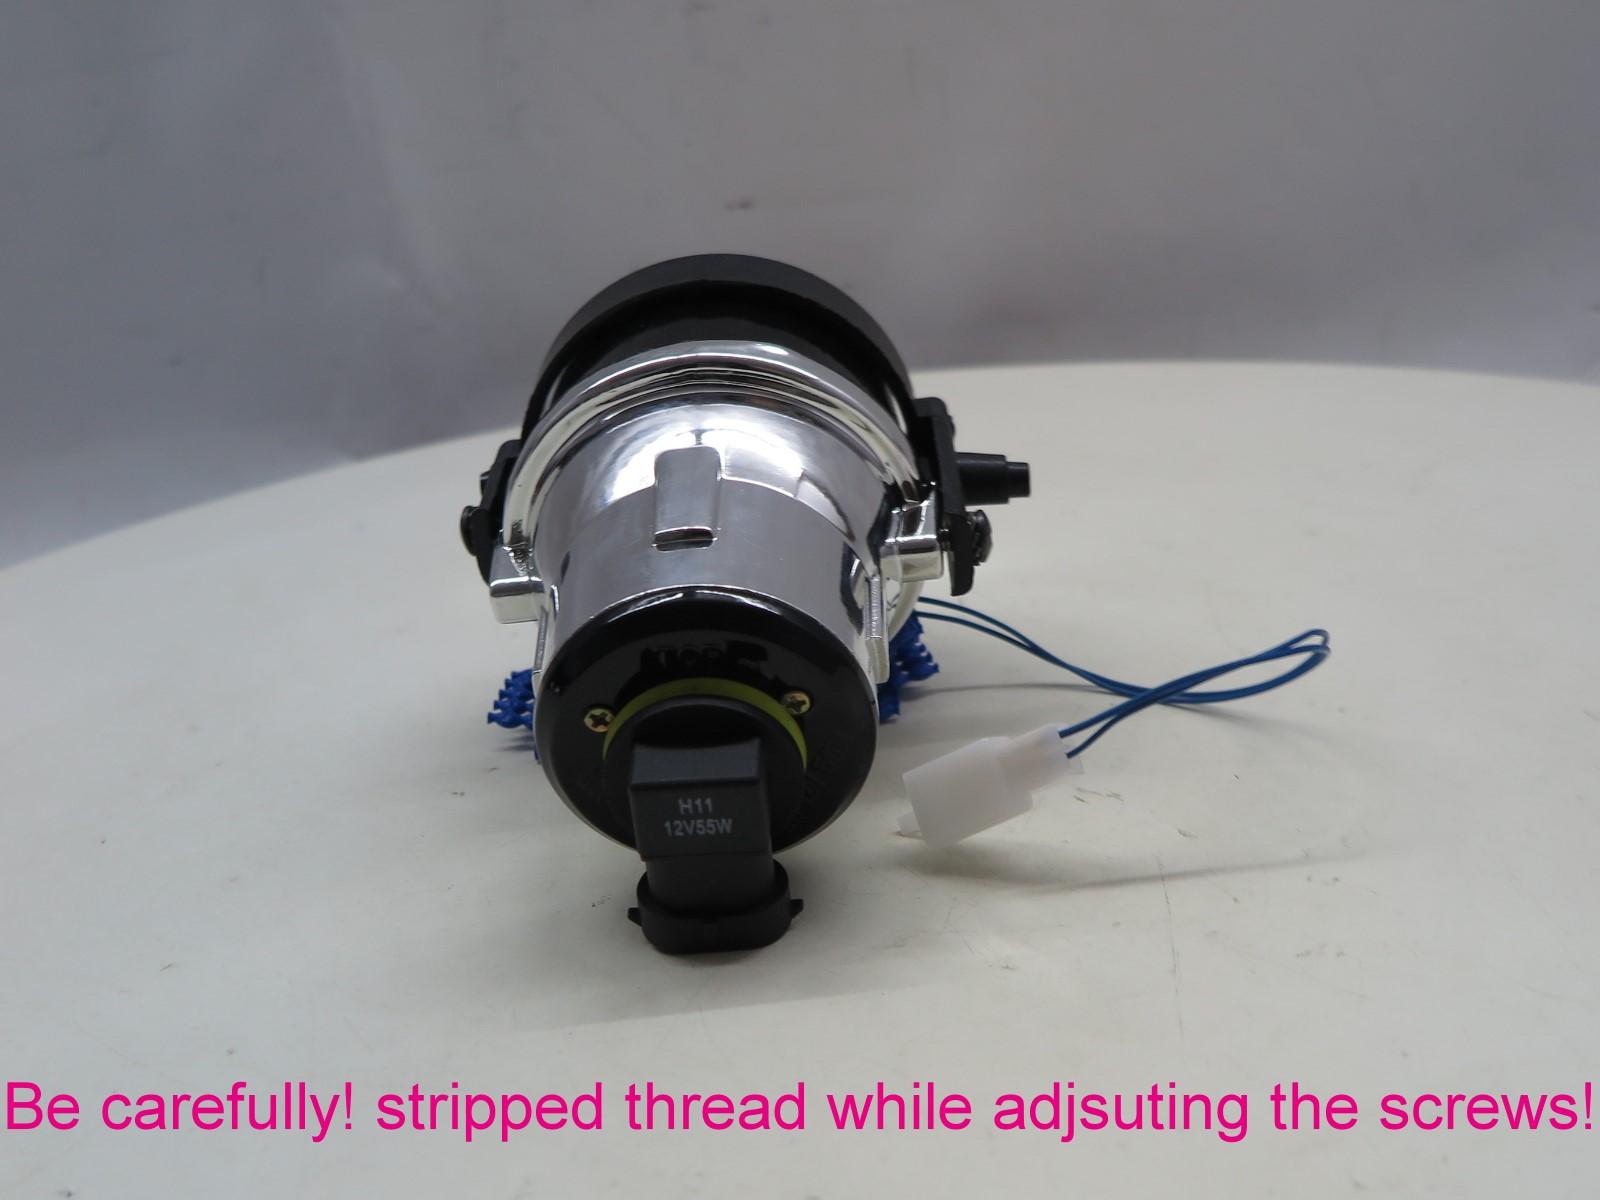 thumbnail 3 - CX-7 2007-2010 SUV 5D Projector Dual Beam Fog Light Black for MAZDA